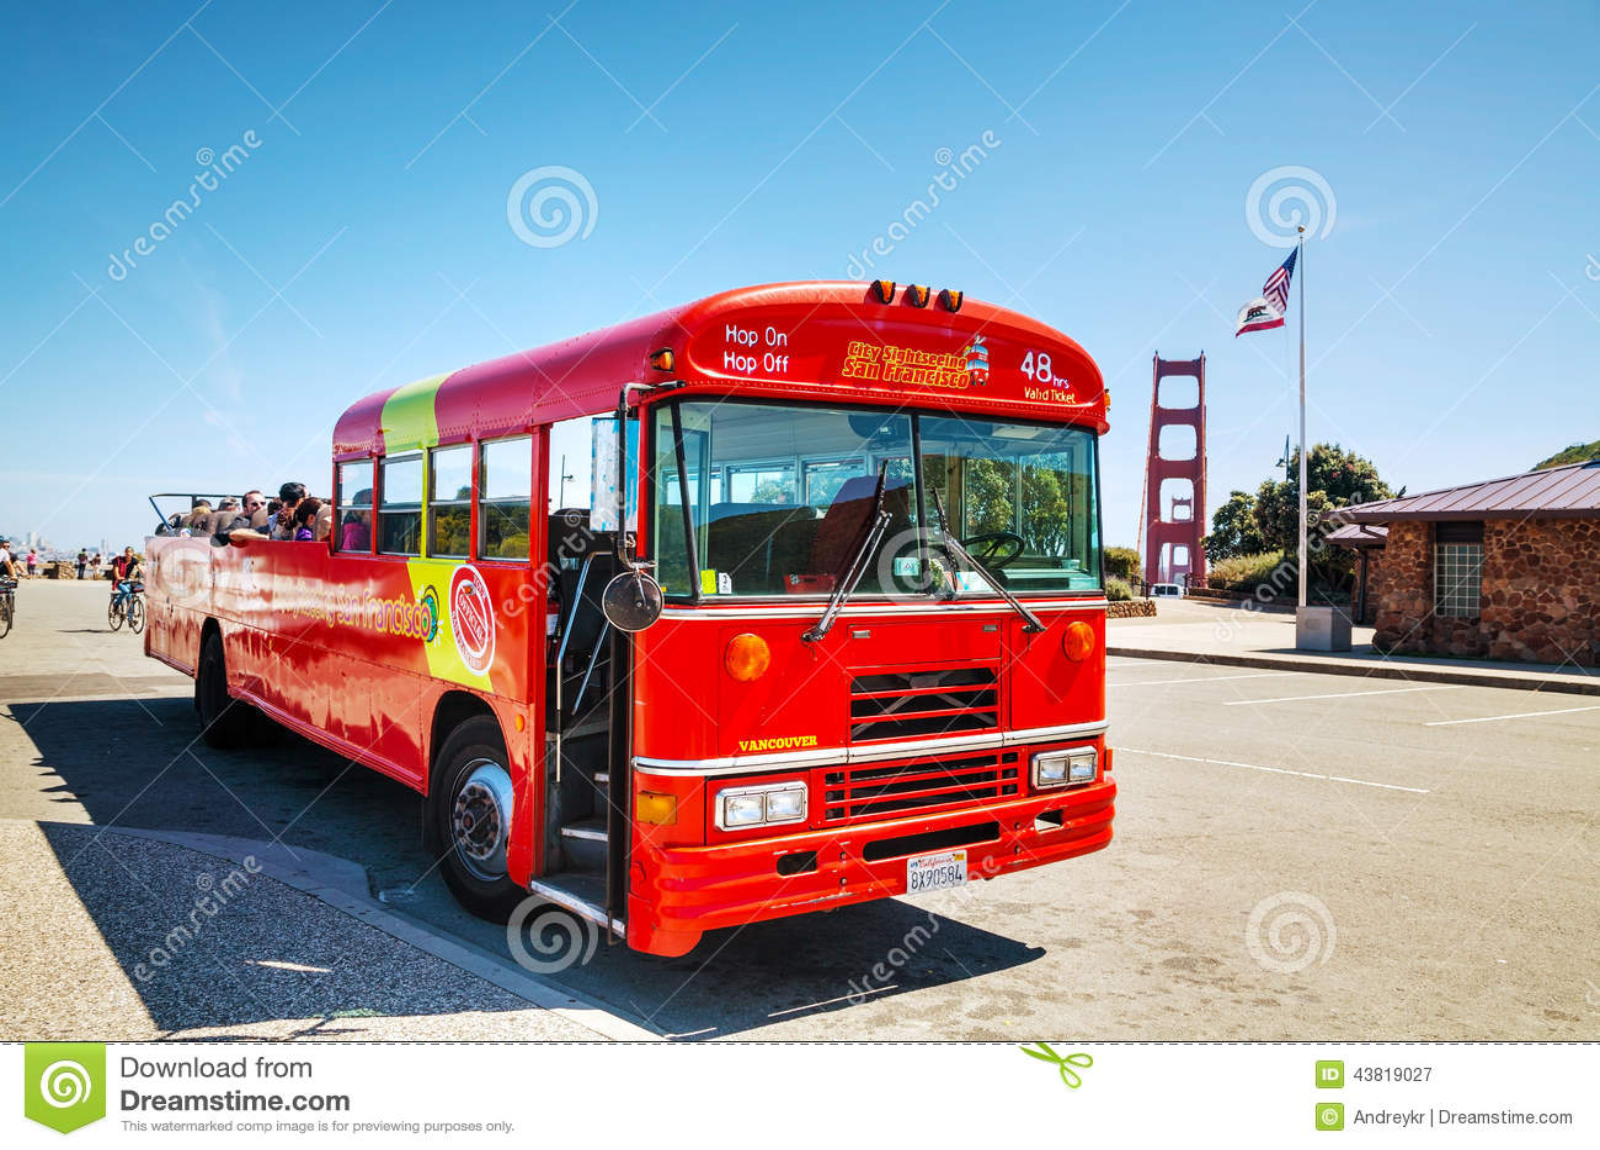 Sightseeing Tour Bus At The Golden Gate Bridge In San